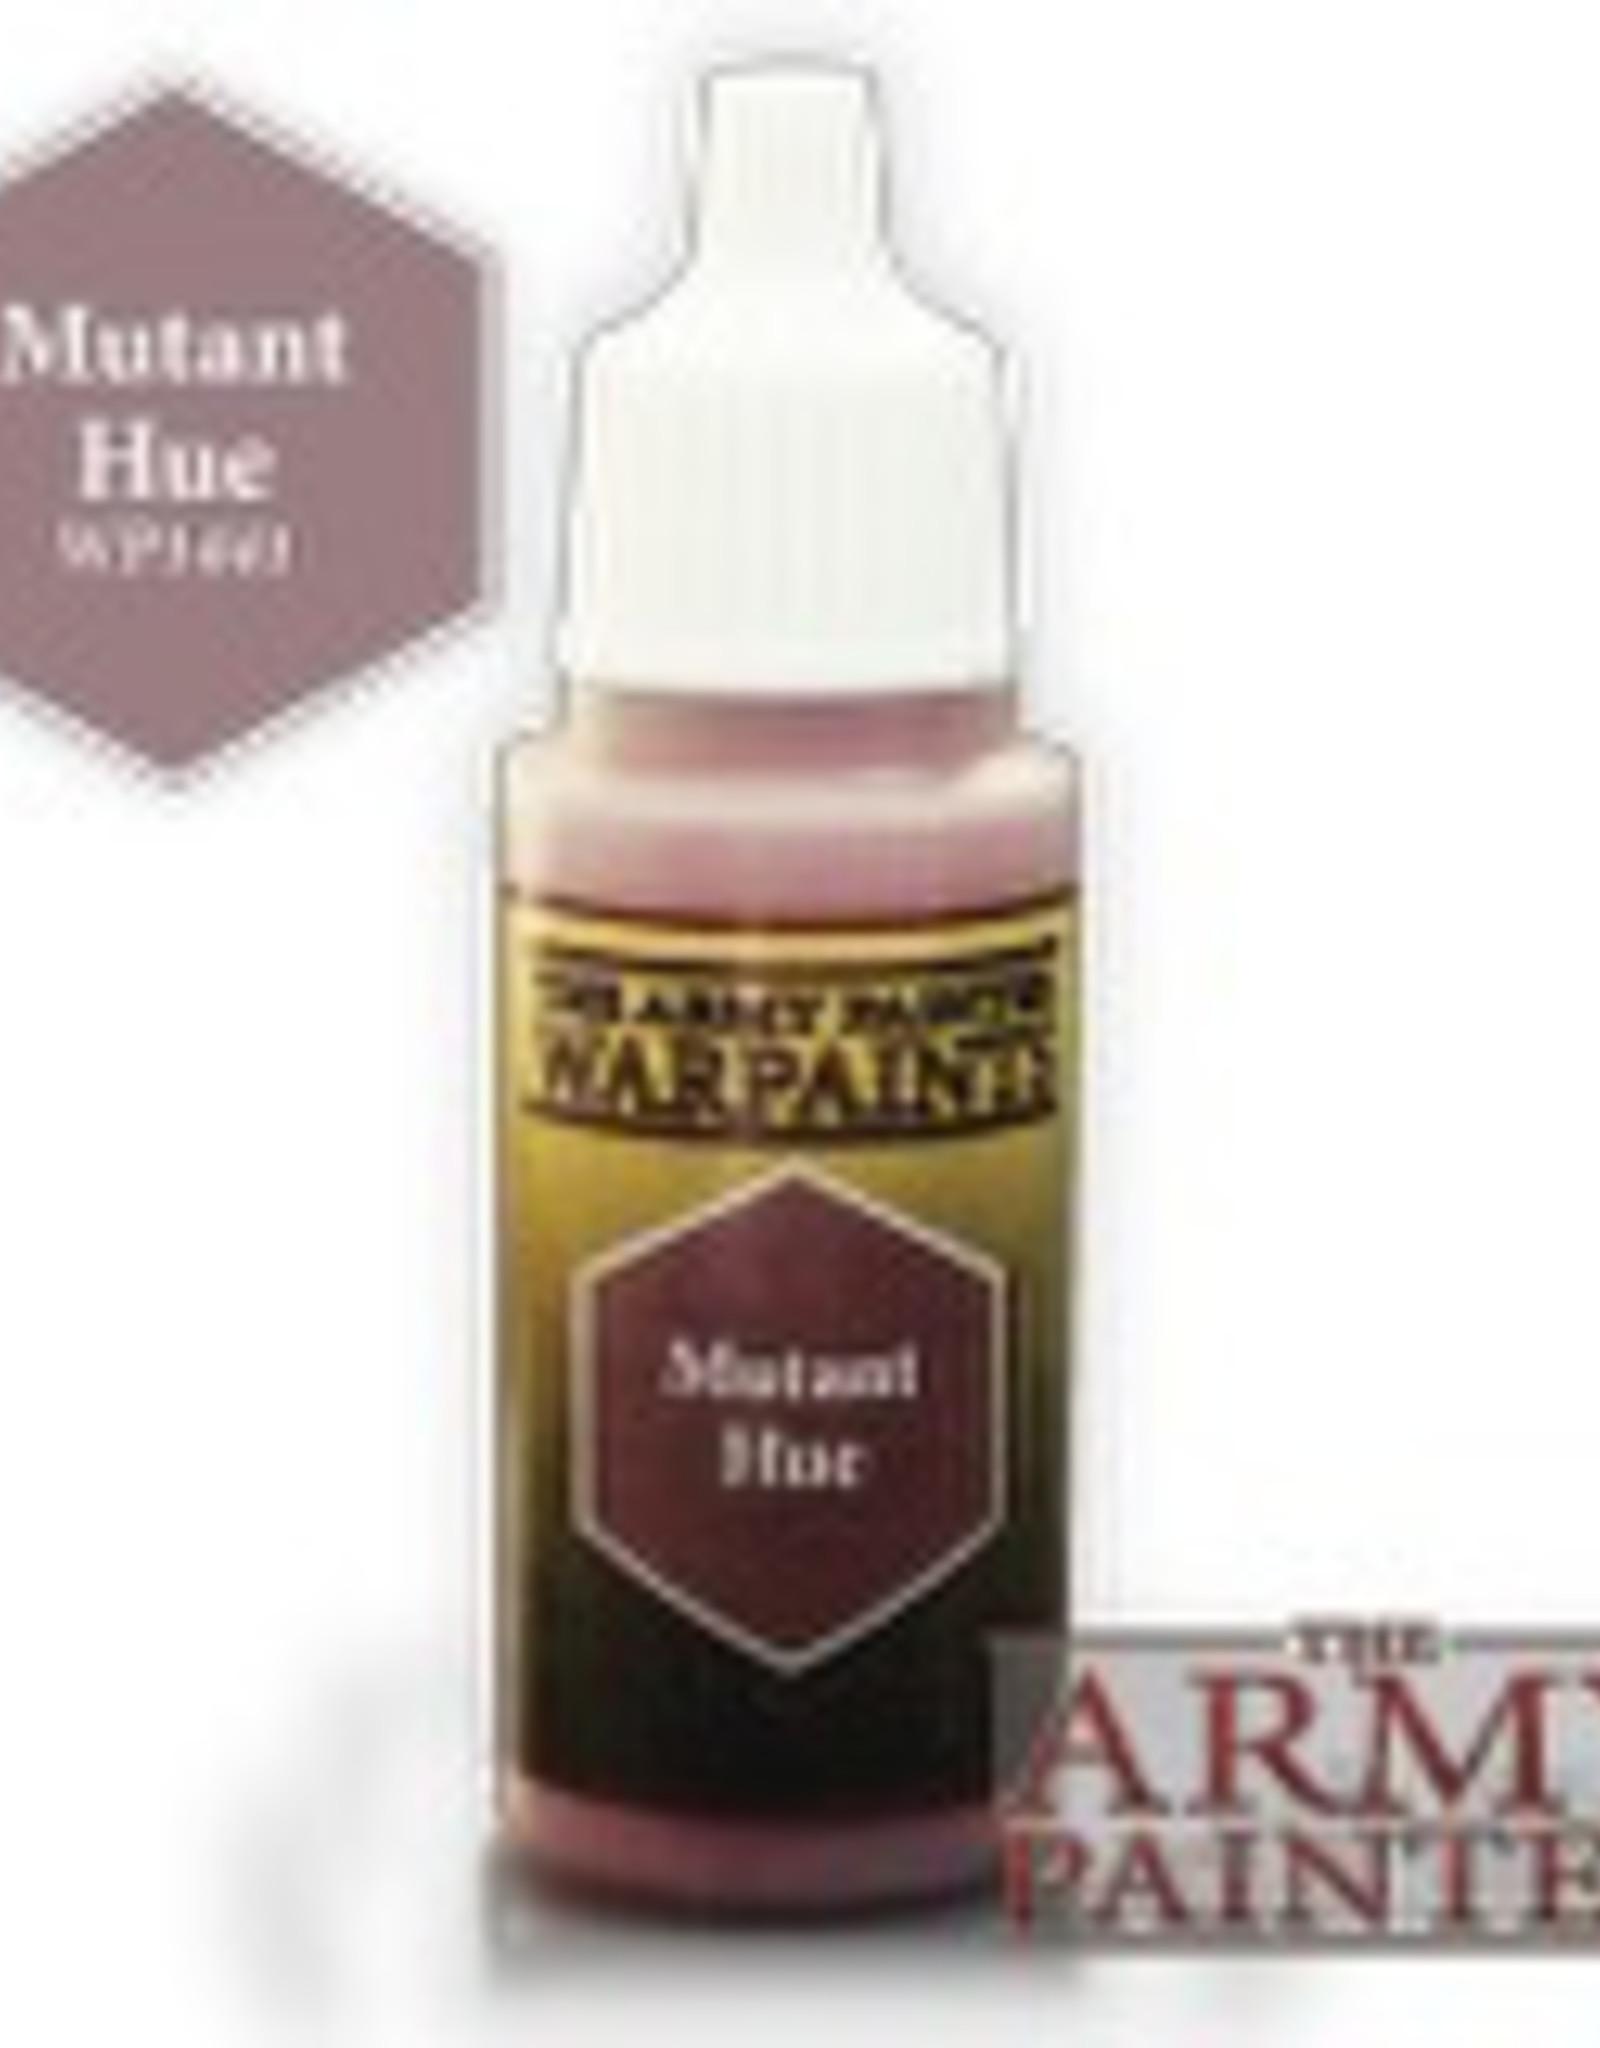 AP - Malen & Basteln Mutant Hue